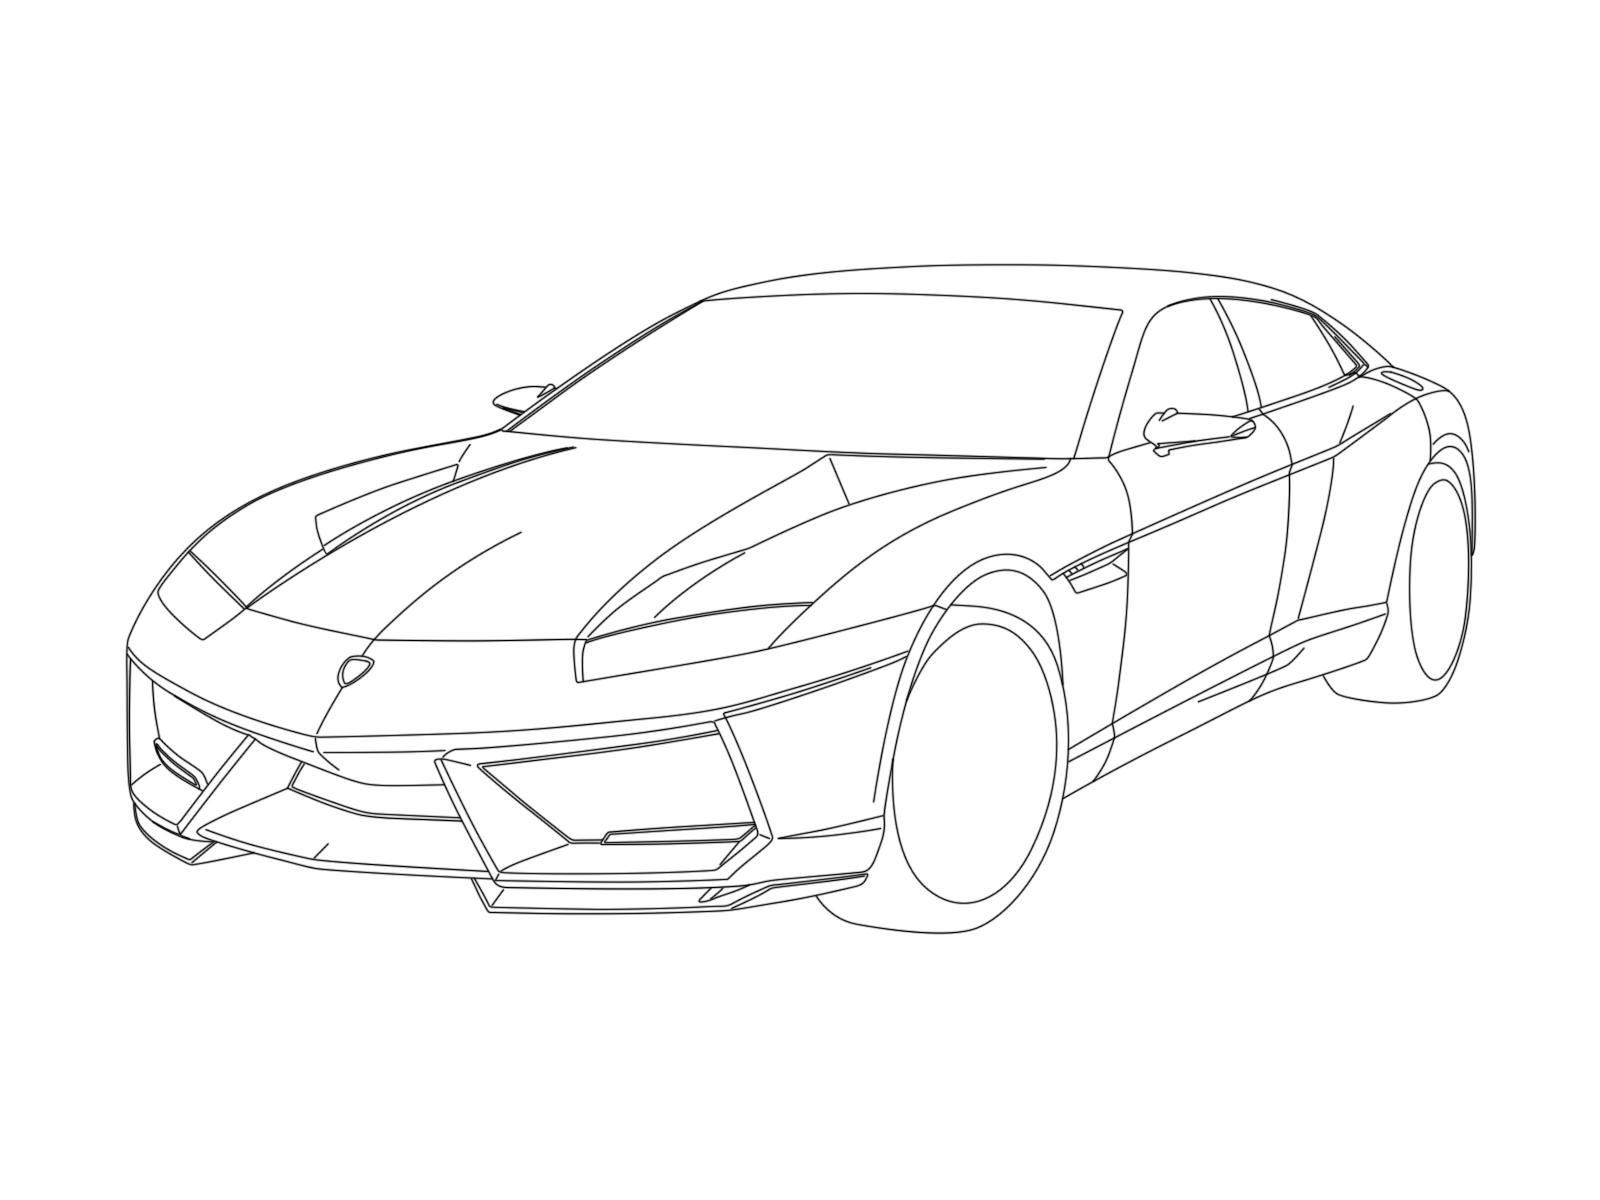 1600x1200 Sketch Lamborghini Veneno Roadster Youtube. Lamborghini Aventador